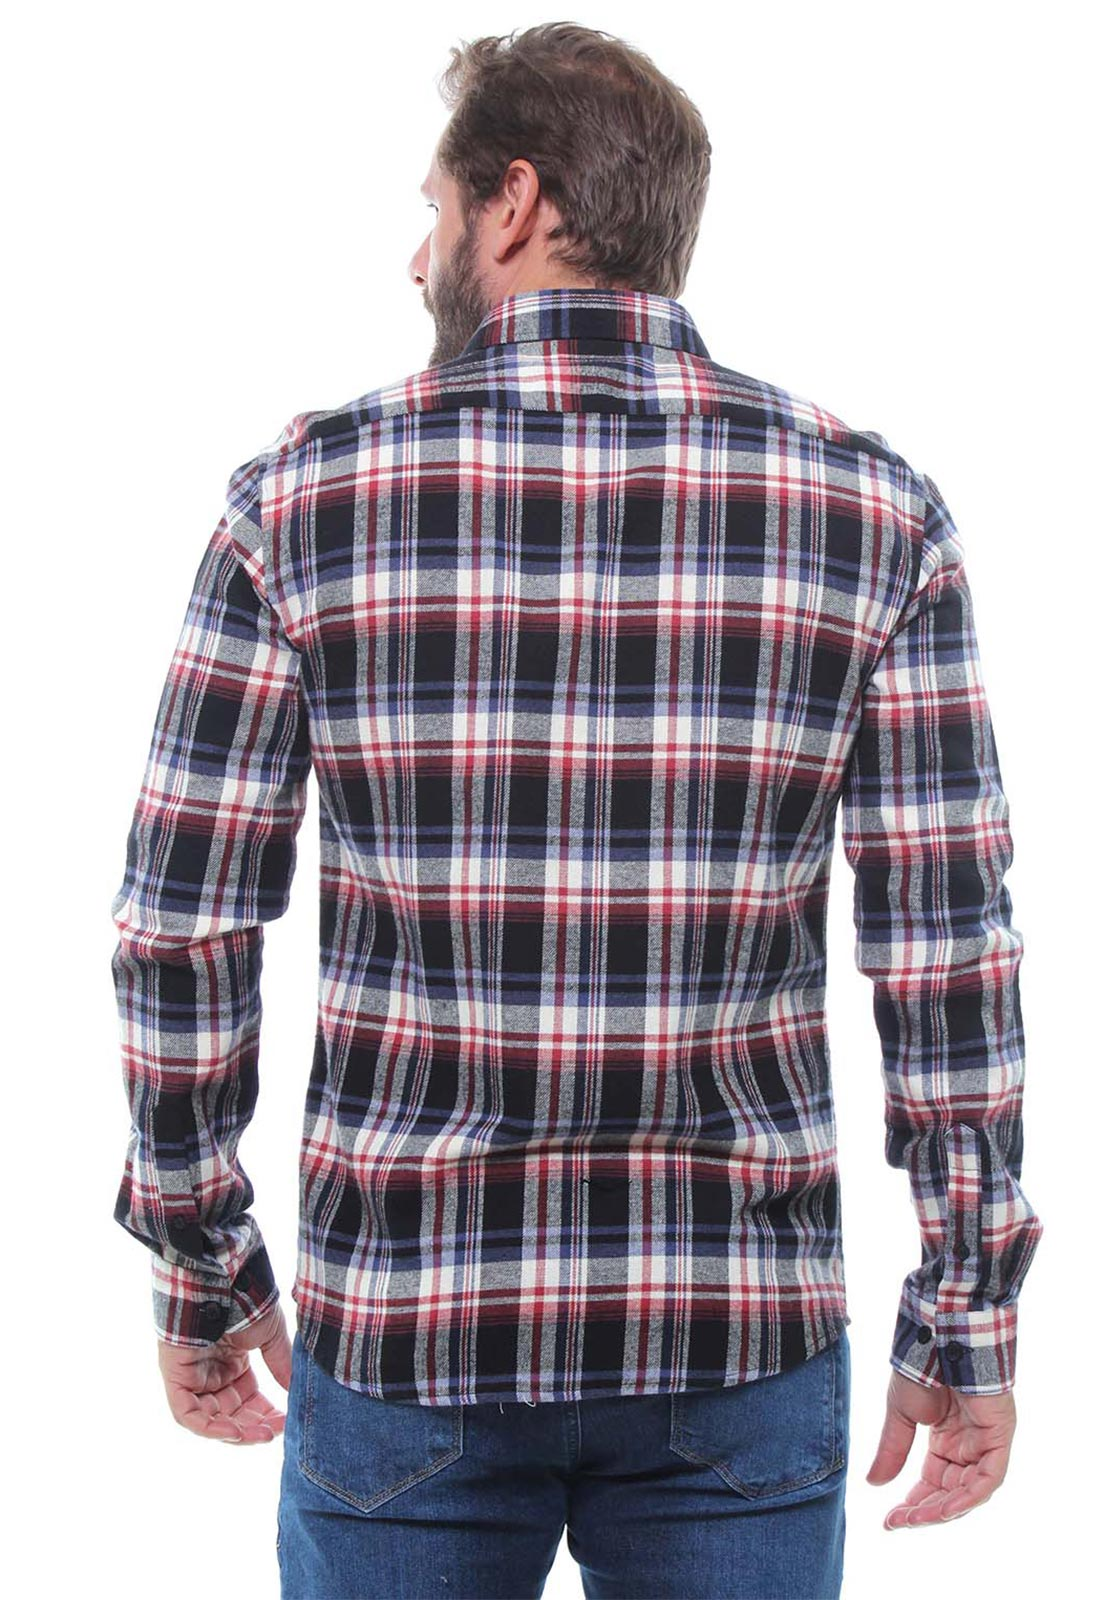 Camisa Xadrez Masculina Flanelada Manga Longa Crocker - 47395  - CROCKER JEANS